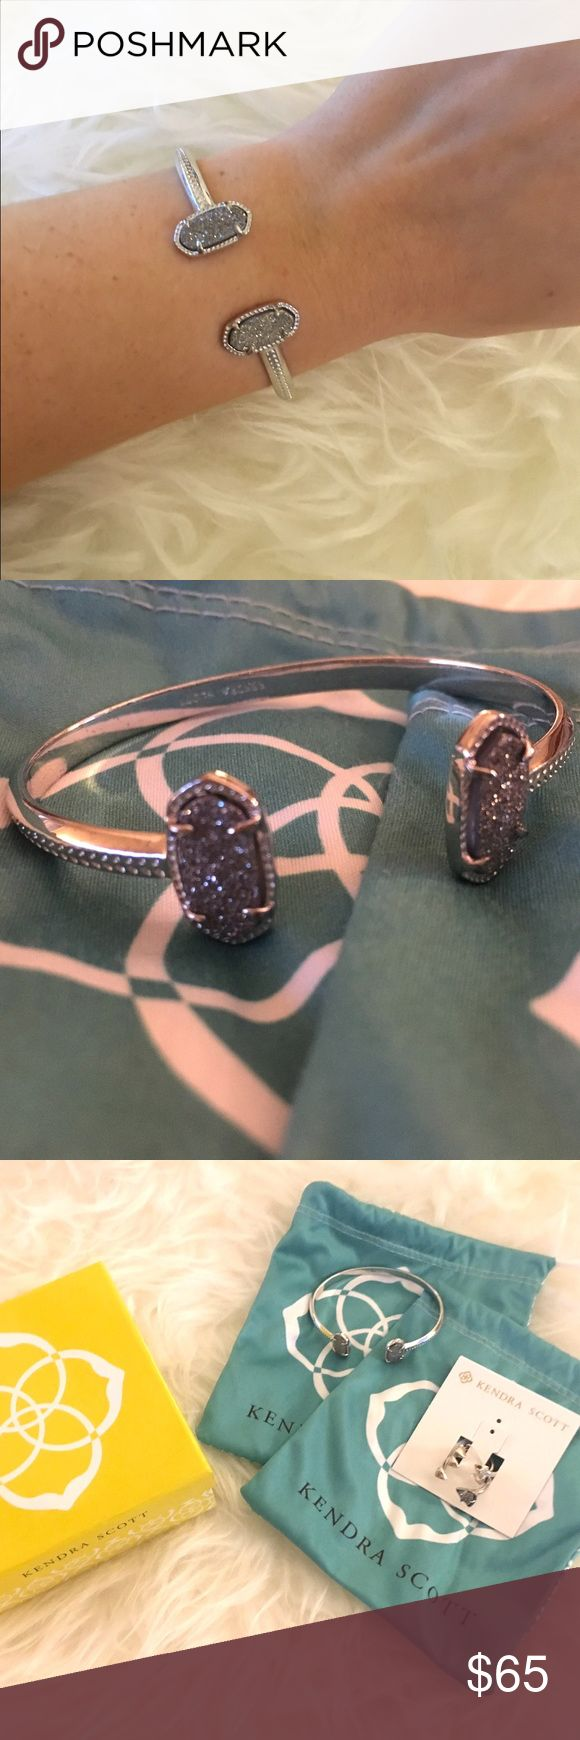 Spotted while shopping on Poshmark: Kendra Scott Silver Drusy Bracelet! #poshmark #fashion #shopping #style #Kendra Scott #Jewelry